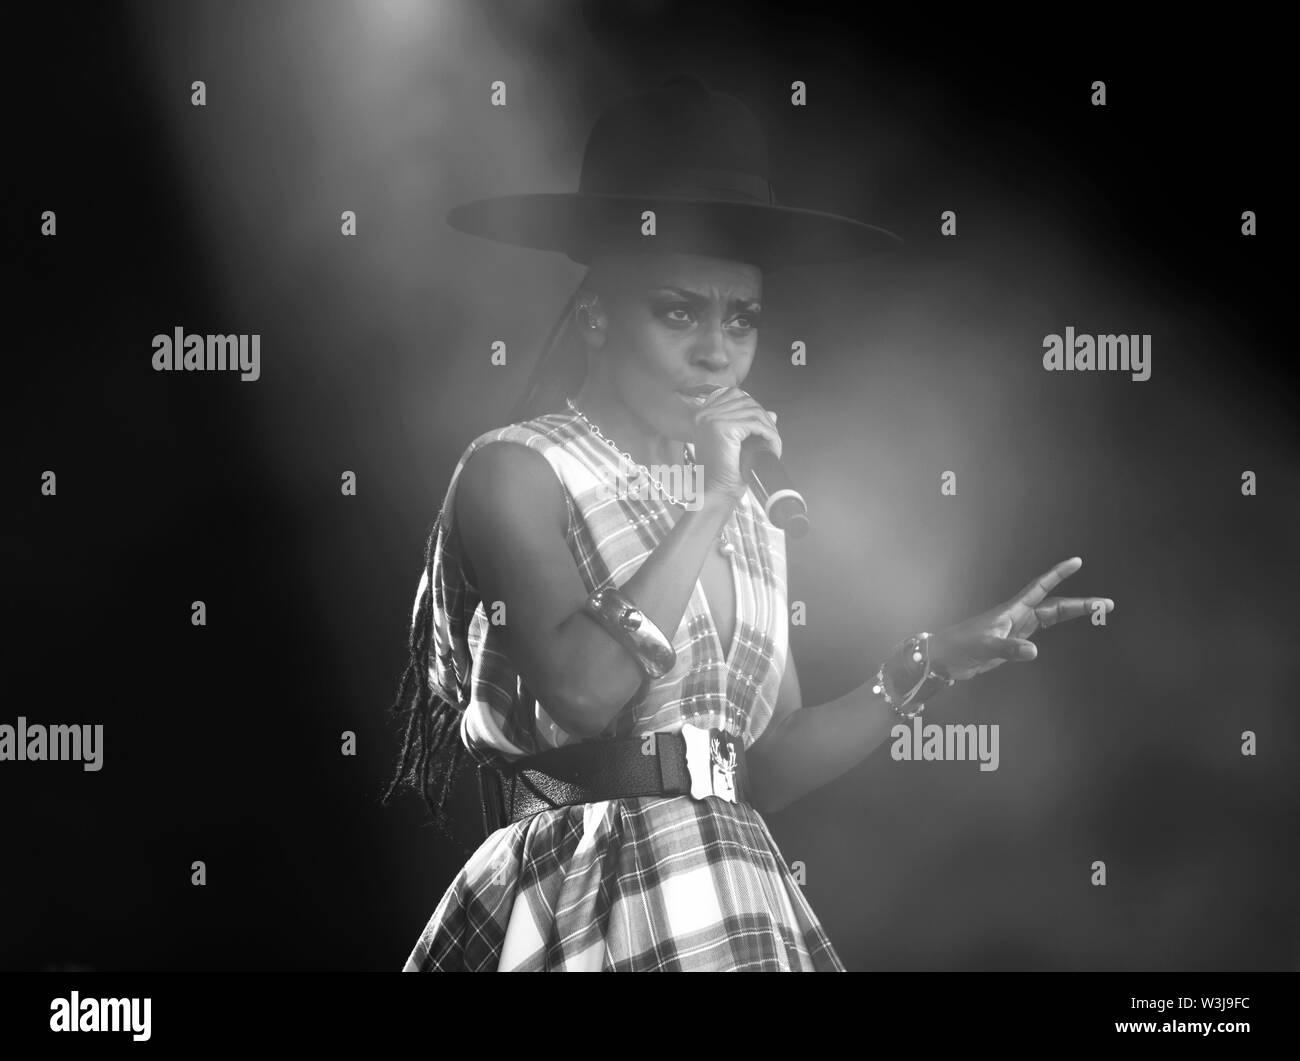 Close-up of Skye Edwards mit Morcheeba, auf der Hauptbühne am OnBlackheath Music Festival 2019 Stockbild